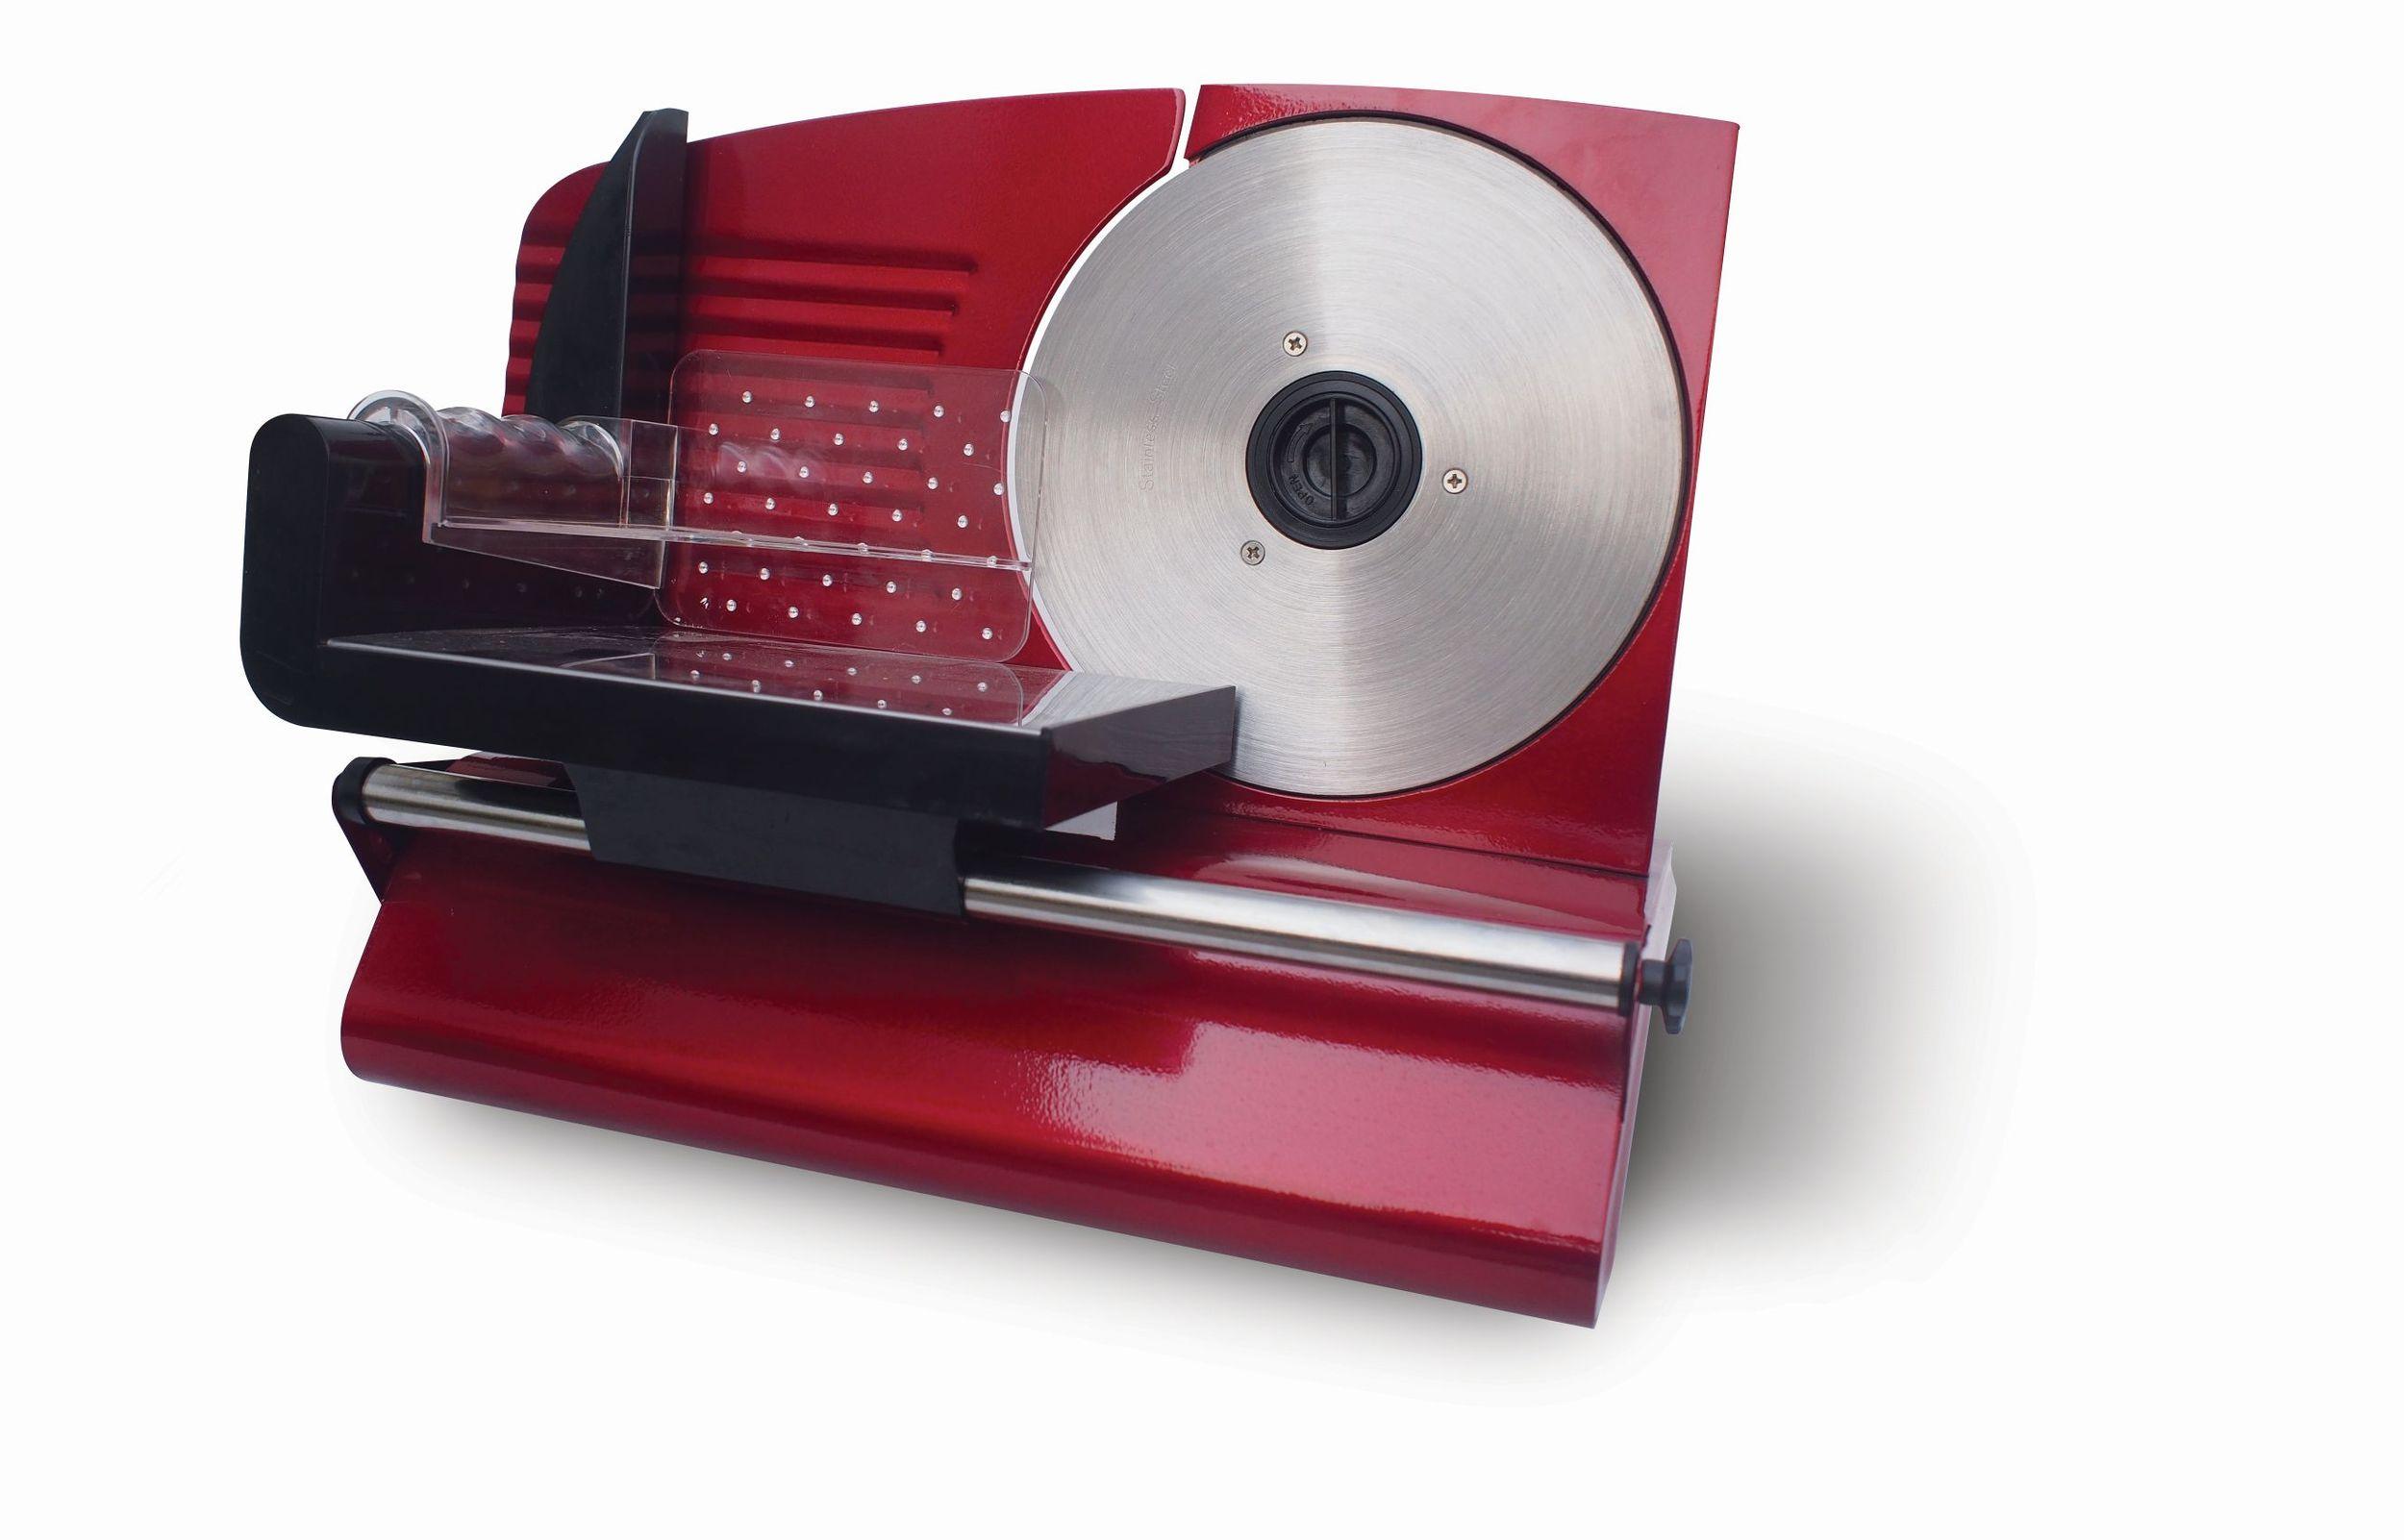 Metall Allesschneider Brotschneidemaschine Edelstahlmesser 19cm Rot*63902